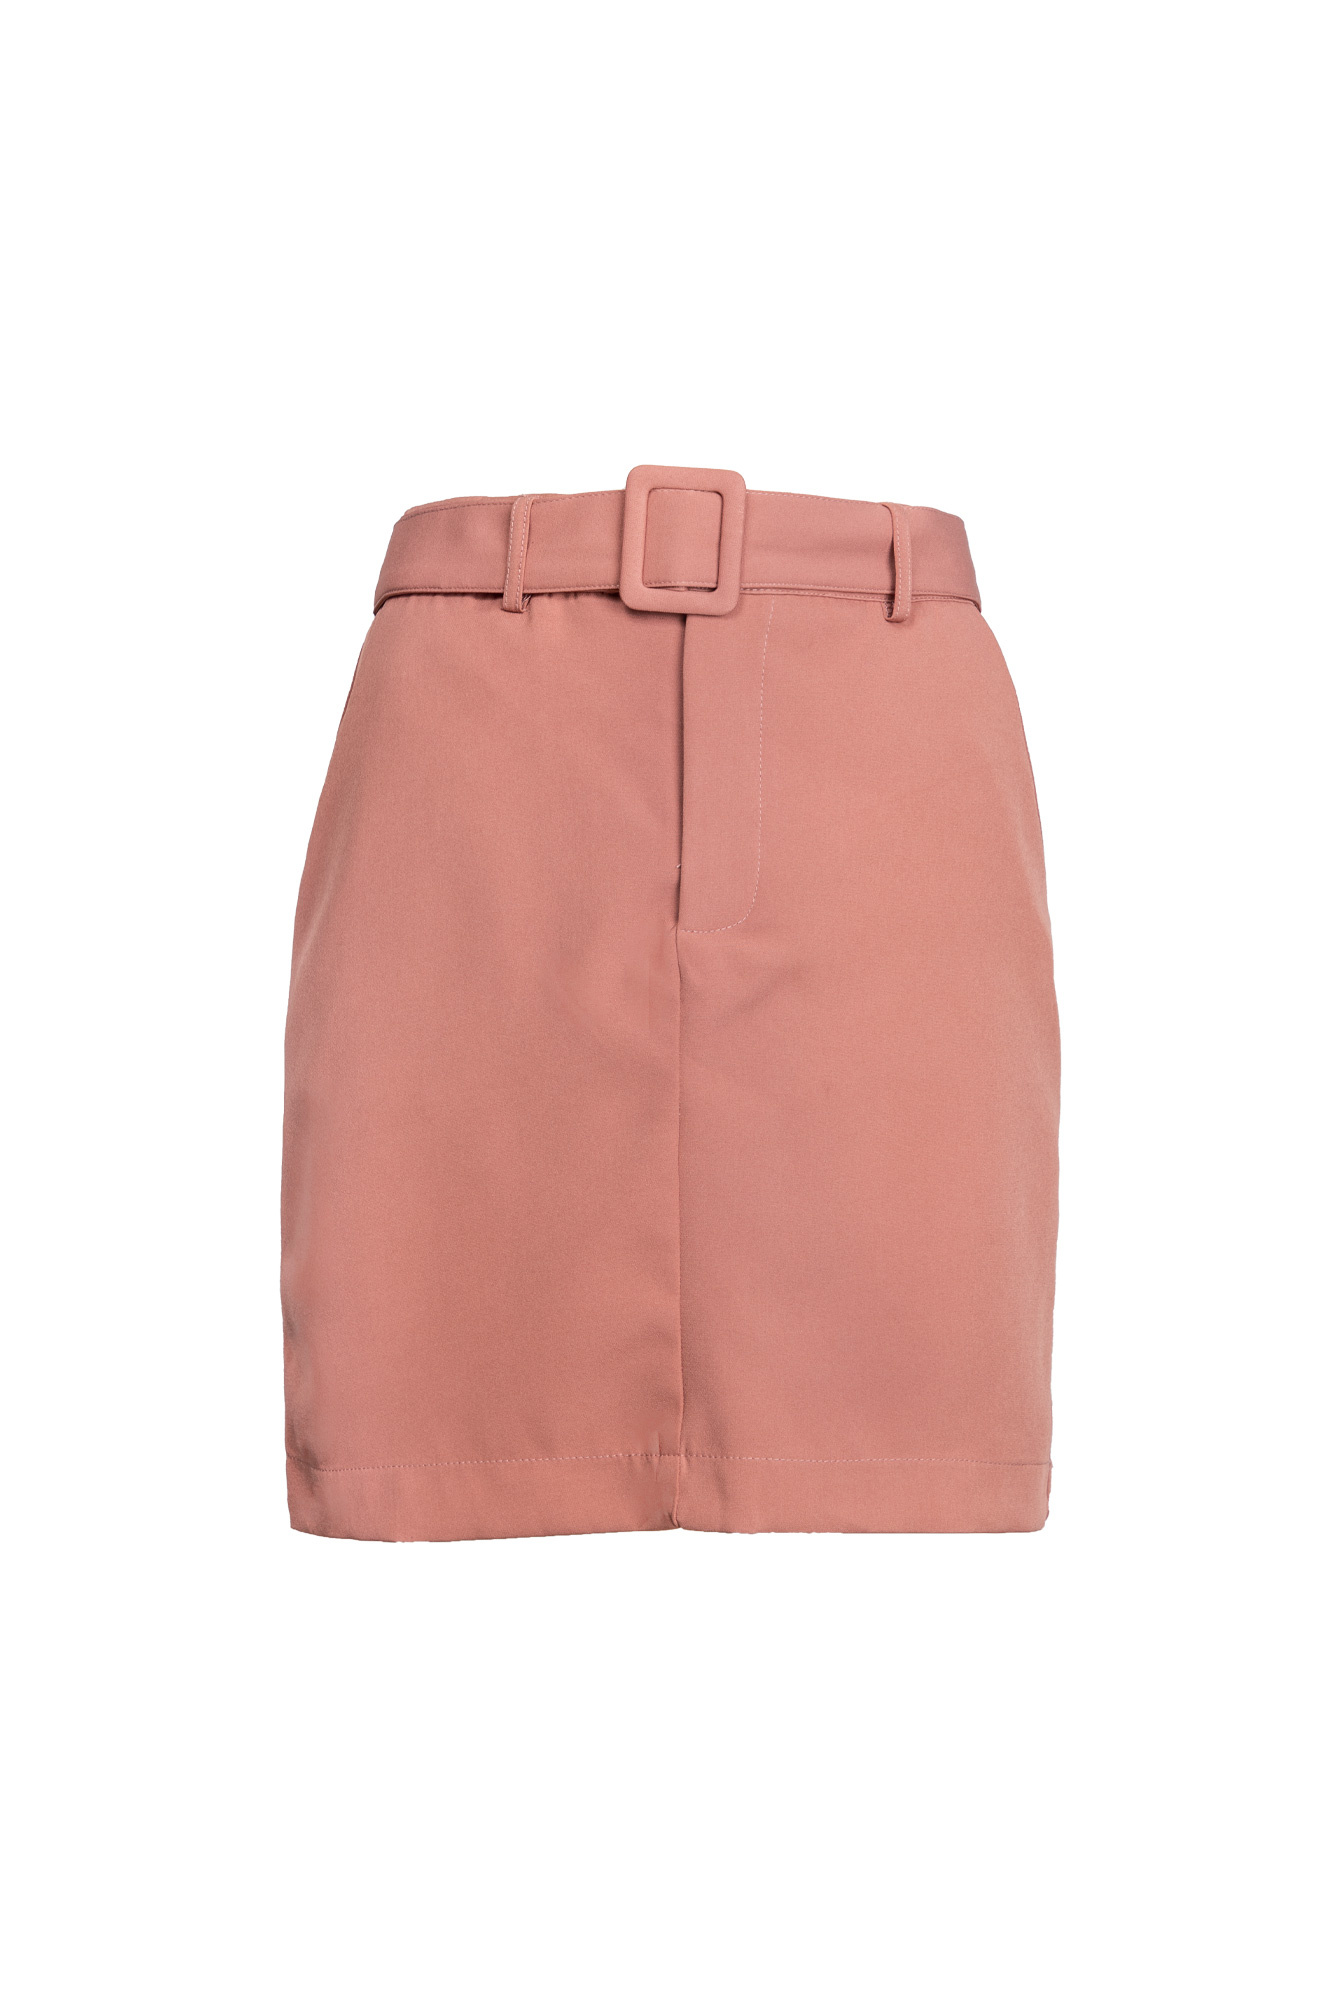 Belted rok pink